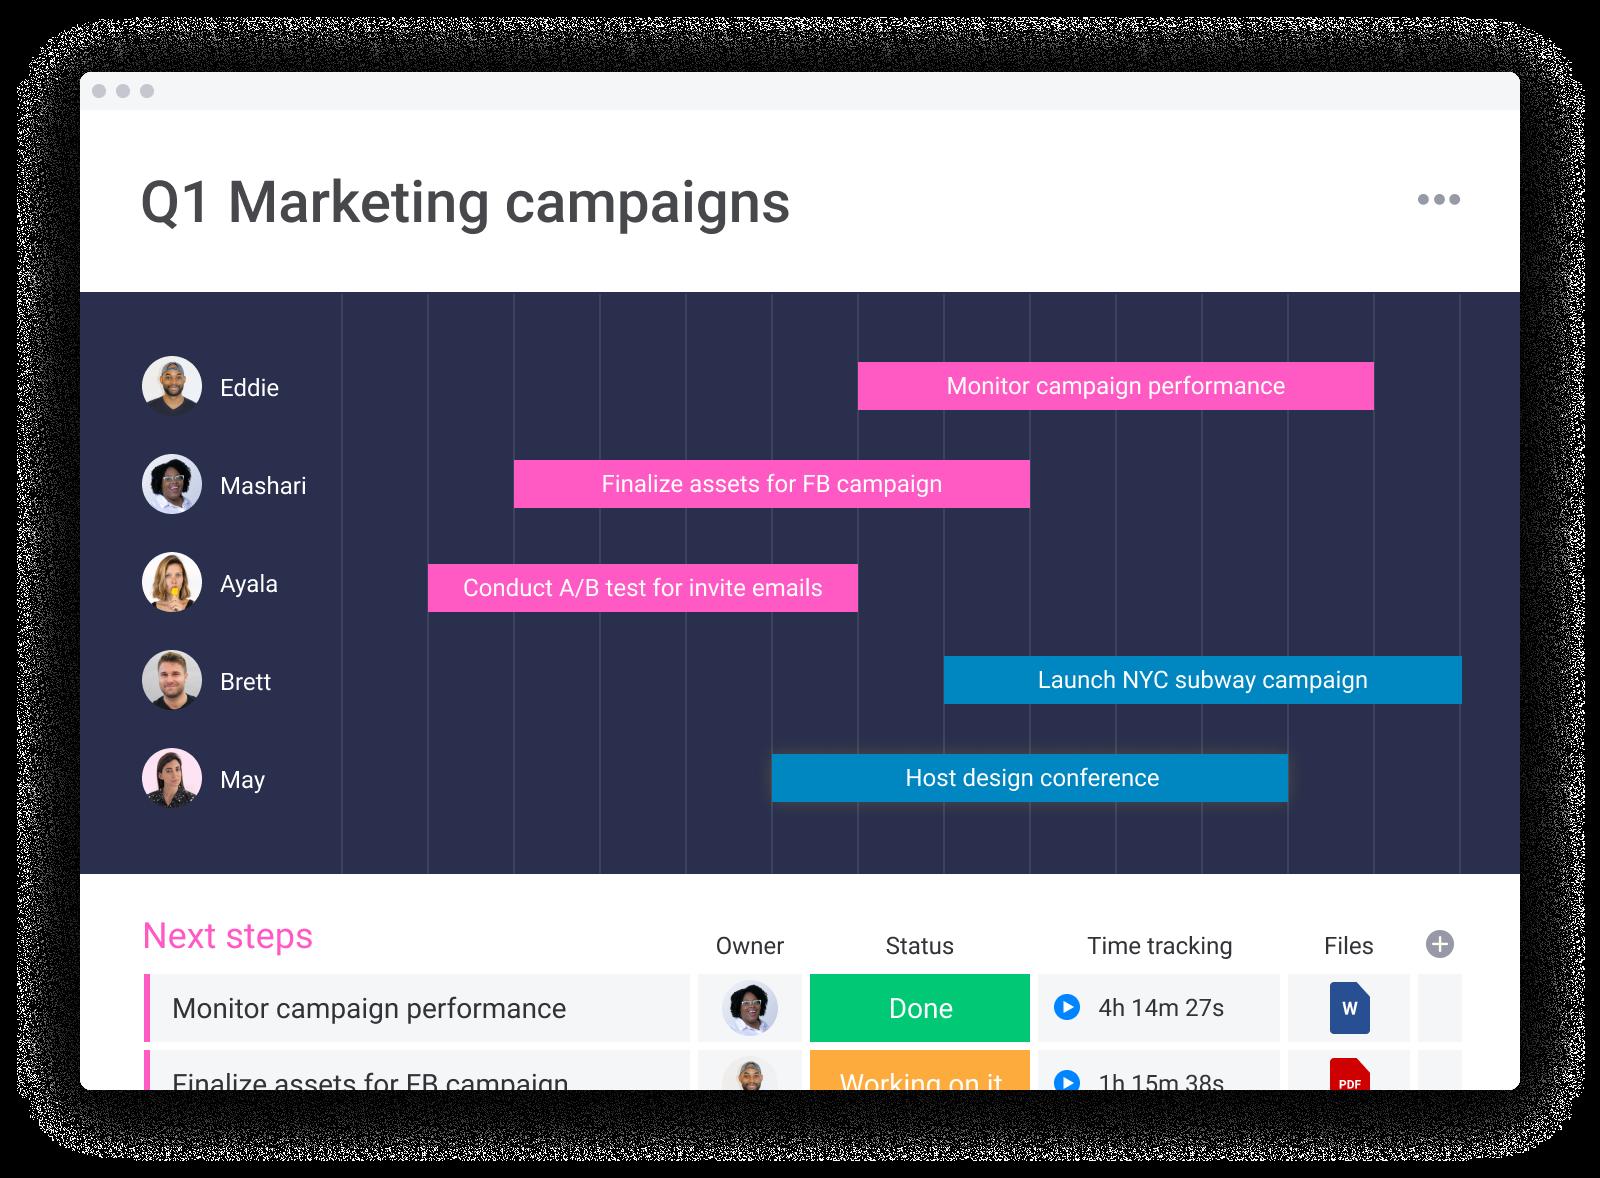 monday.com CRM-Simple board_Timeline_Q1 Marketing campaigns